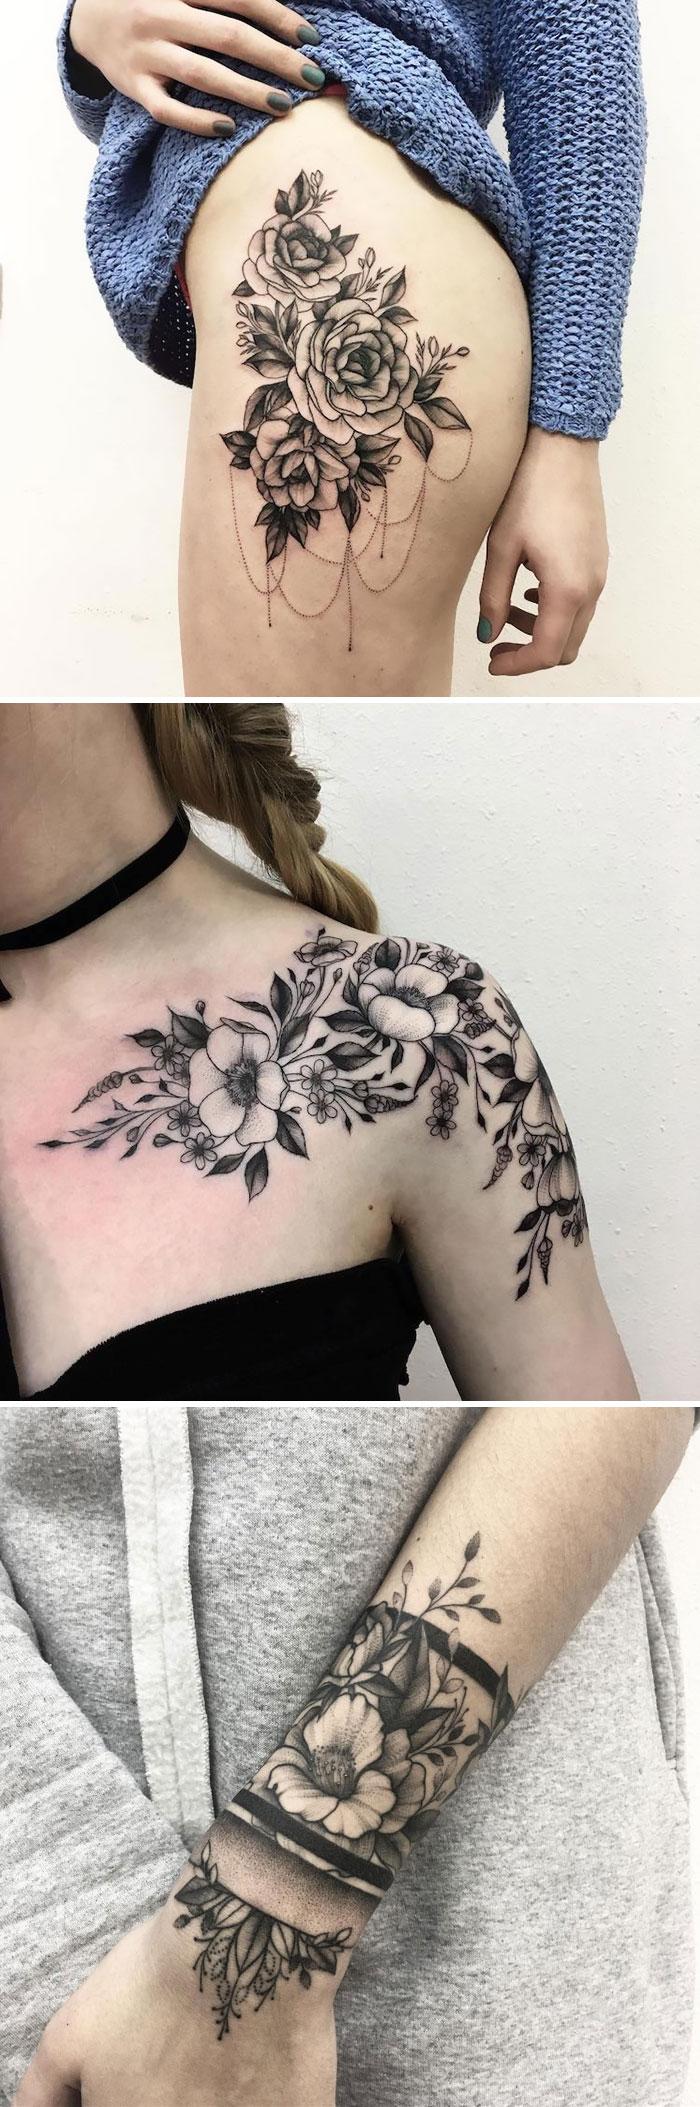 tatuagens-florais (19)